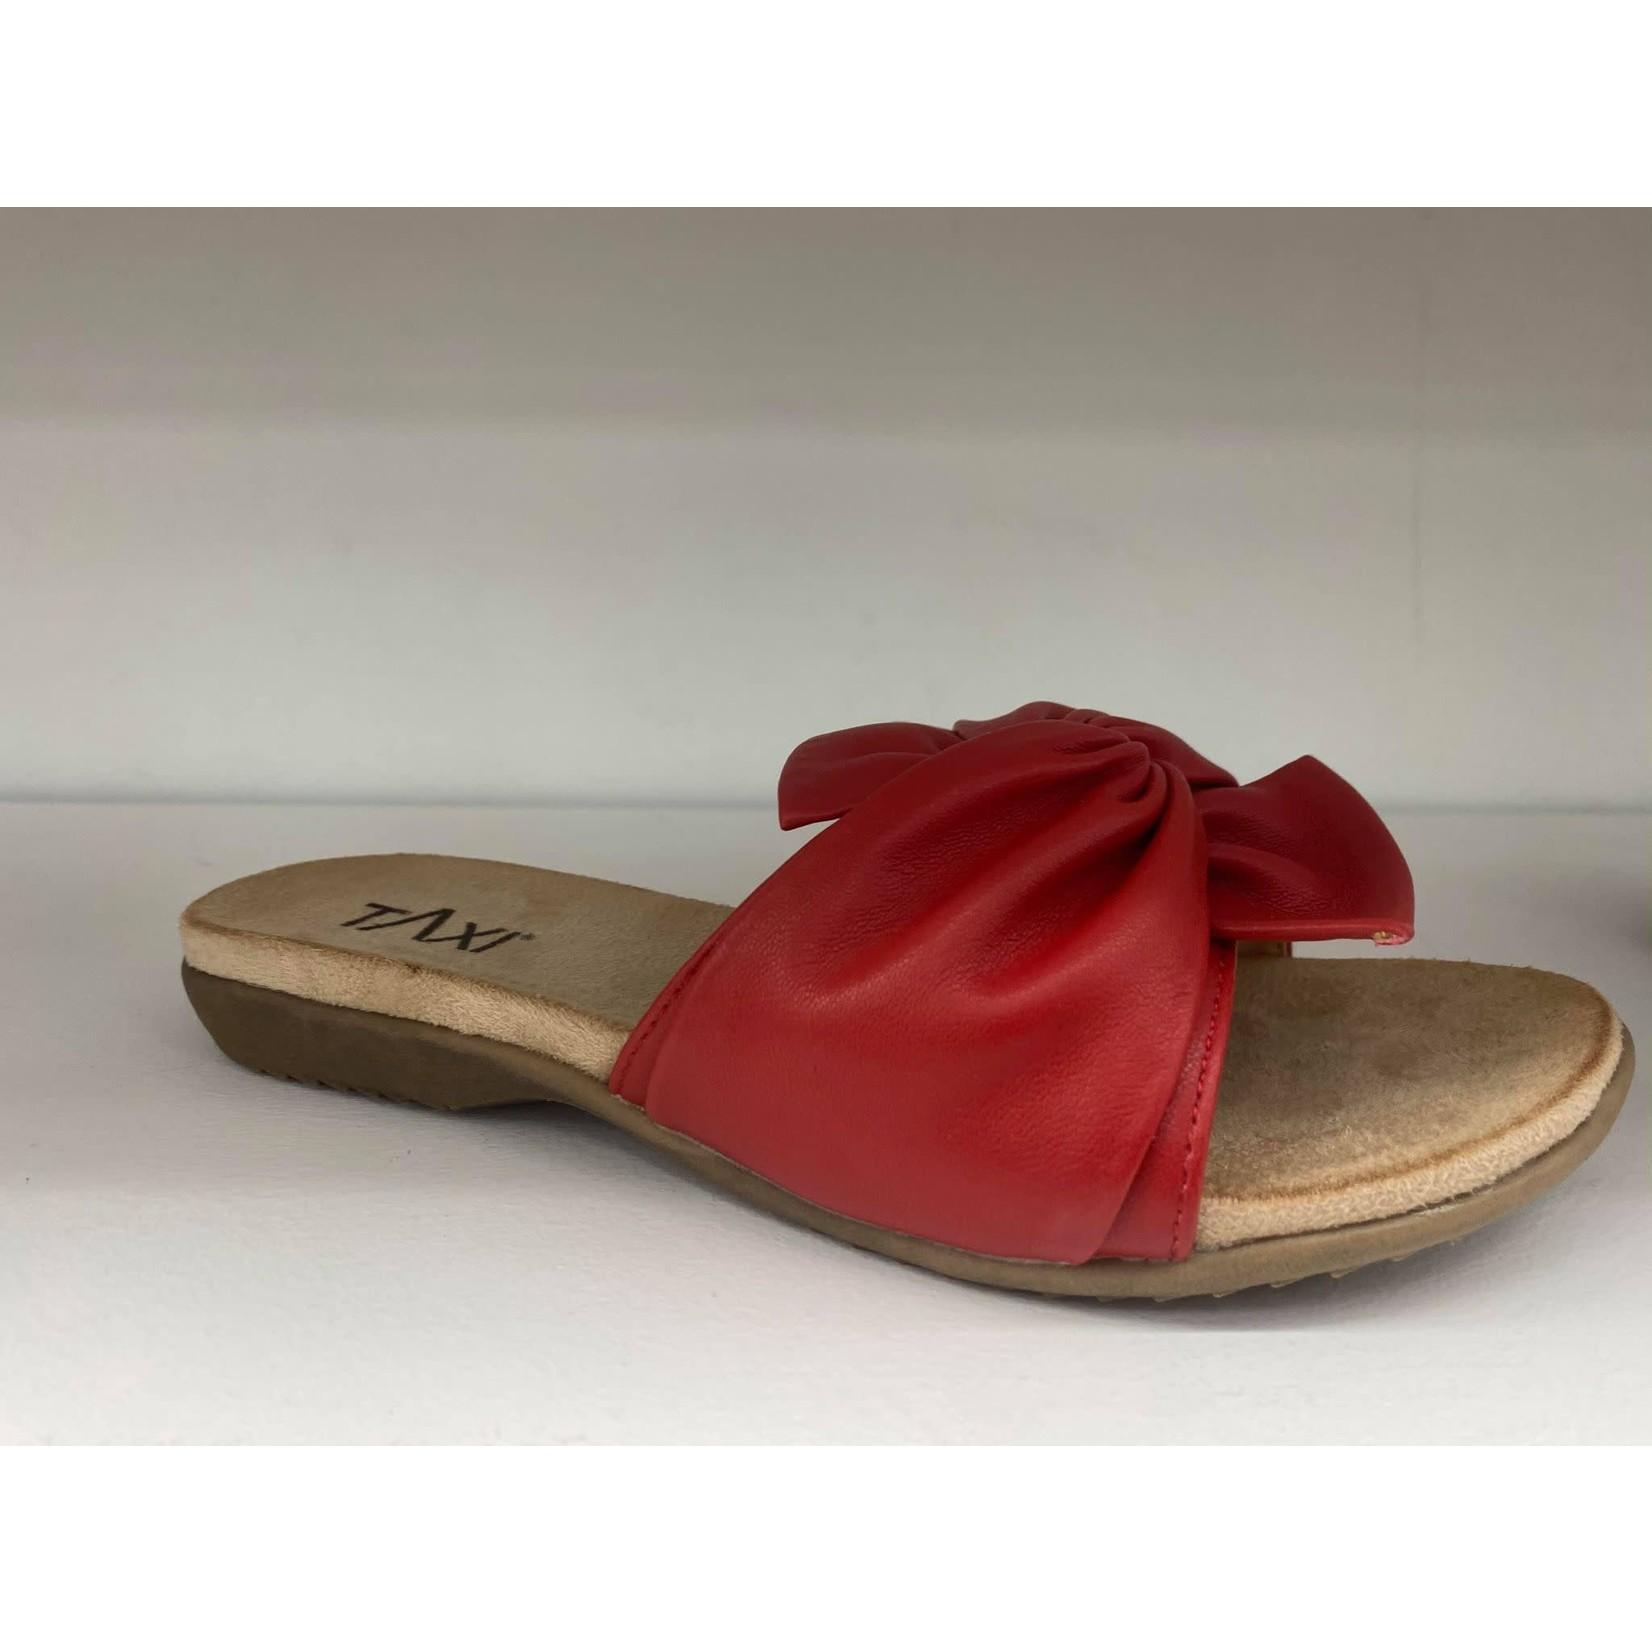 Taxi Footwear Amalfi Slip On *Colors*